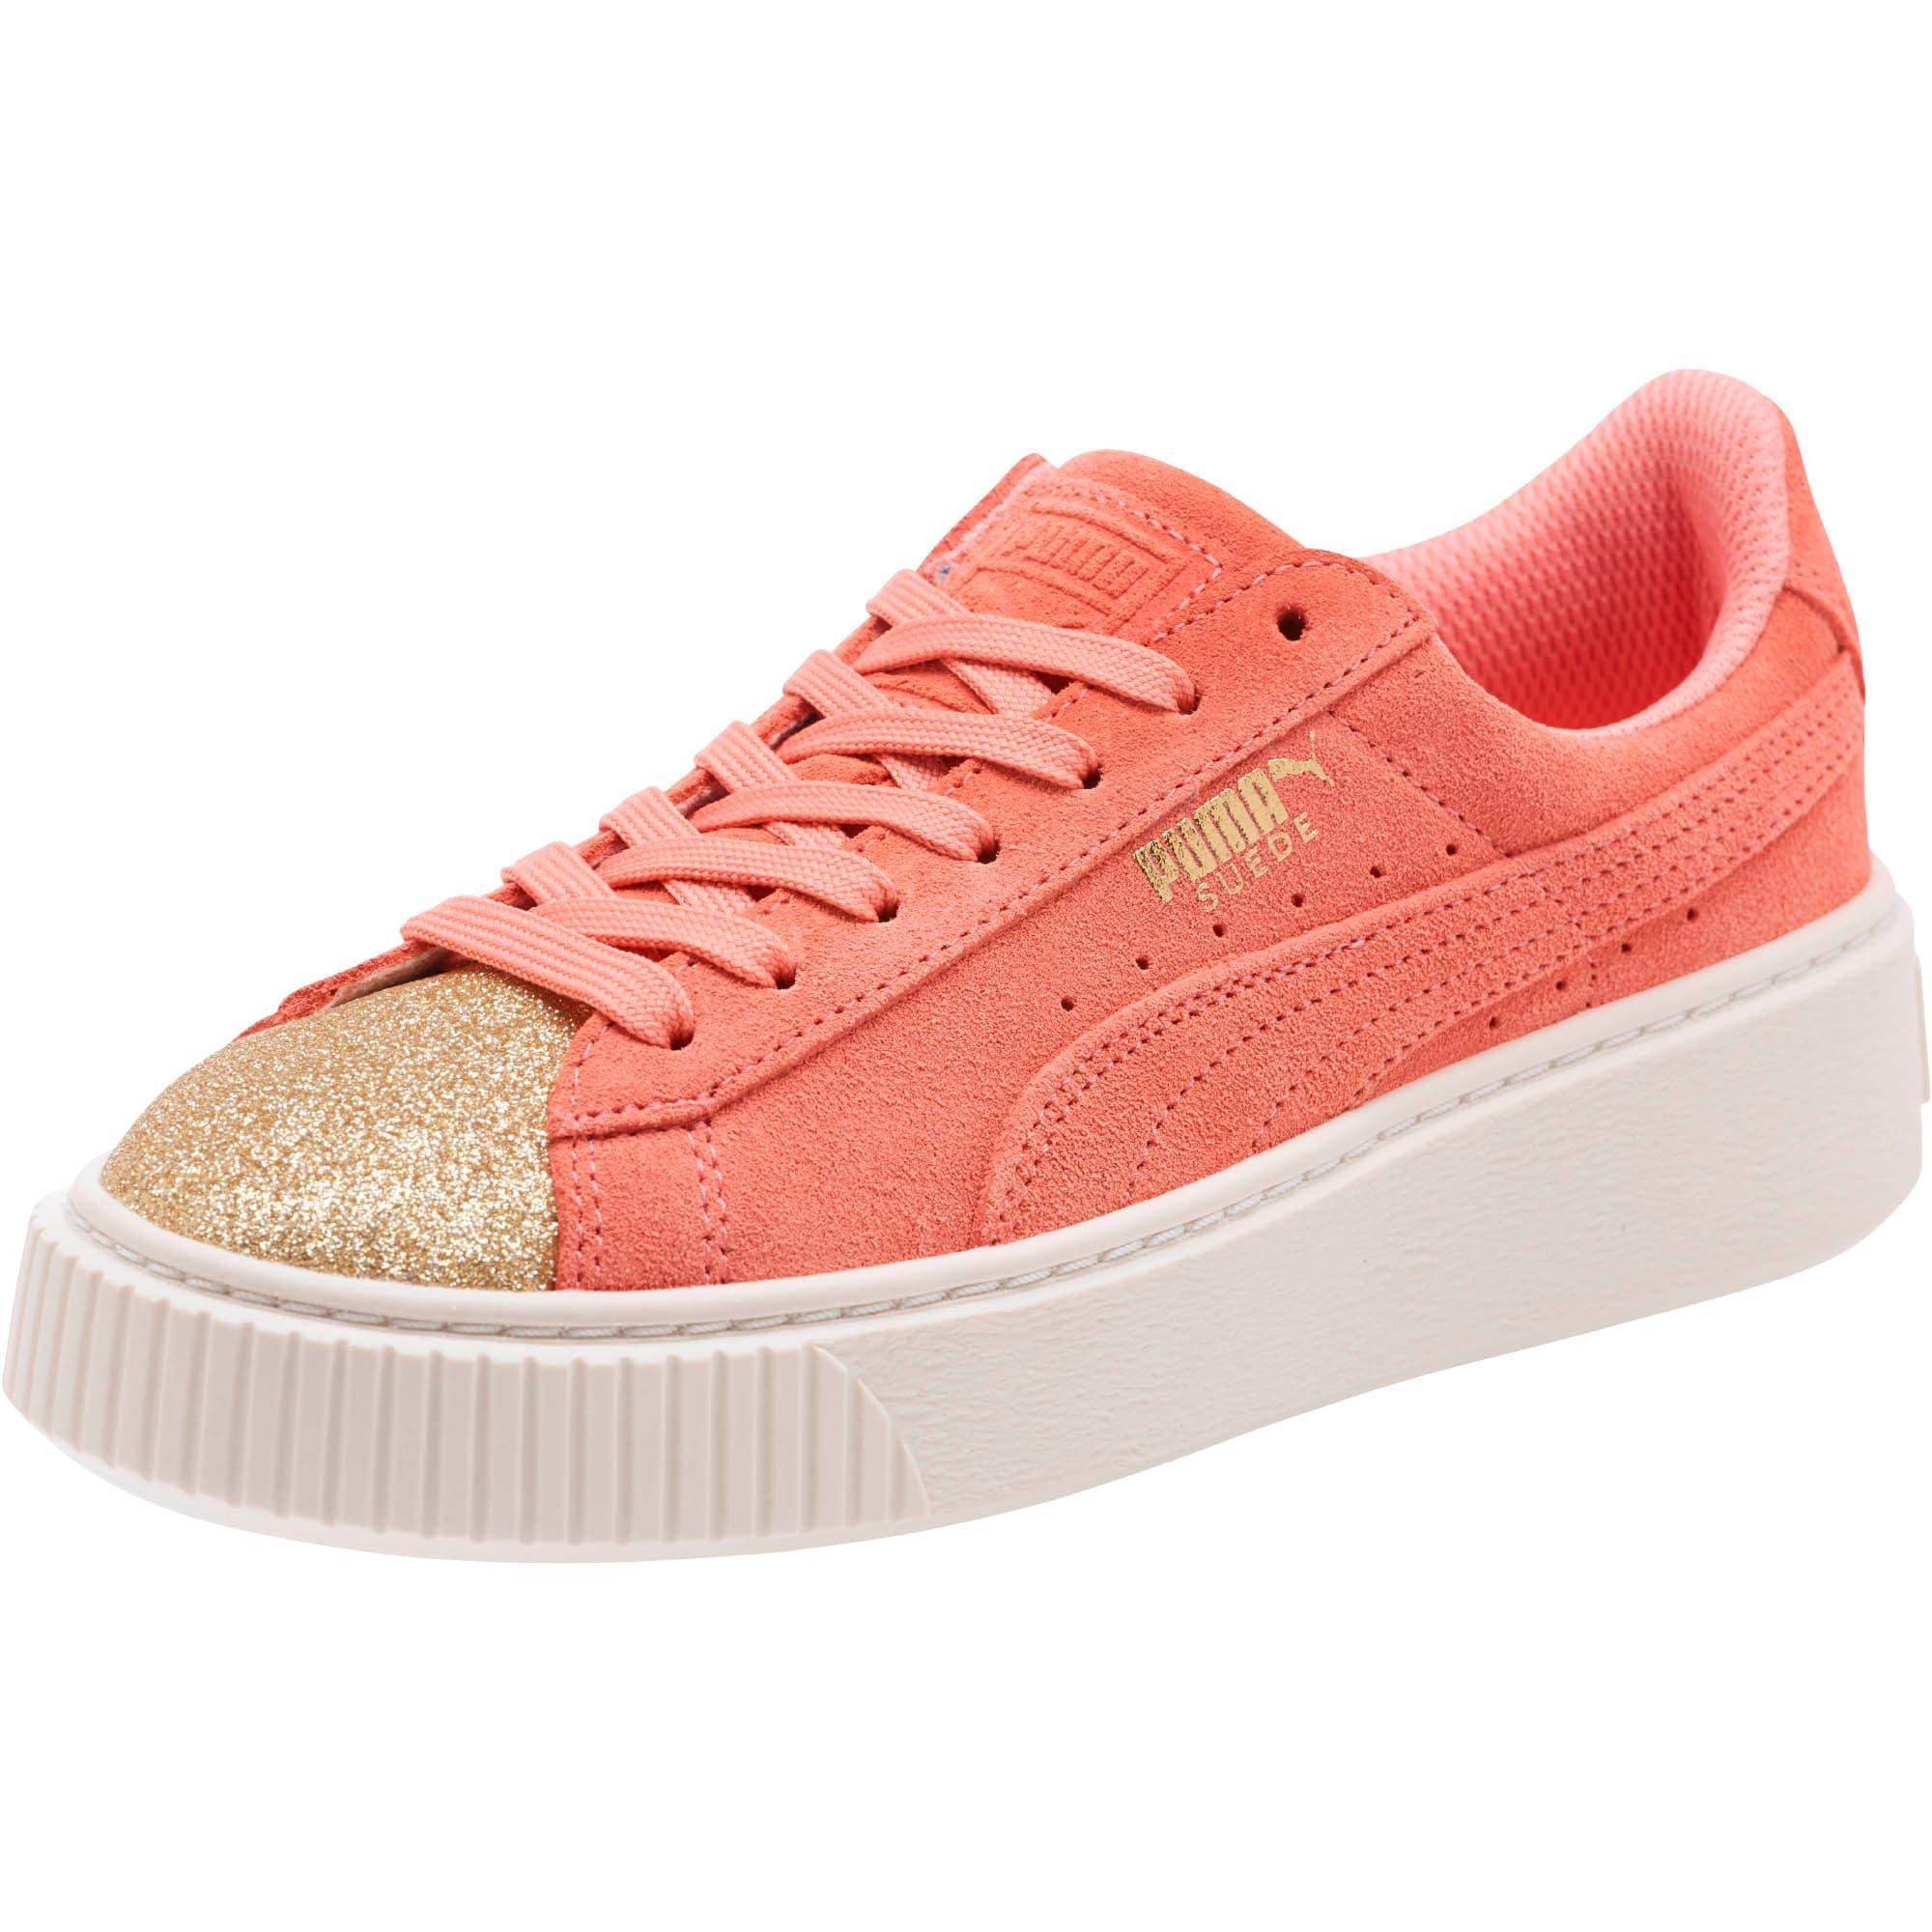 best cheap 34dac 5c237 Suede Platform Glam Girls' Sneakers